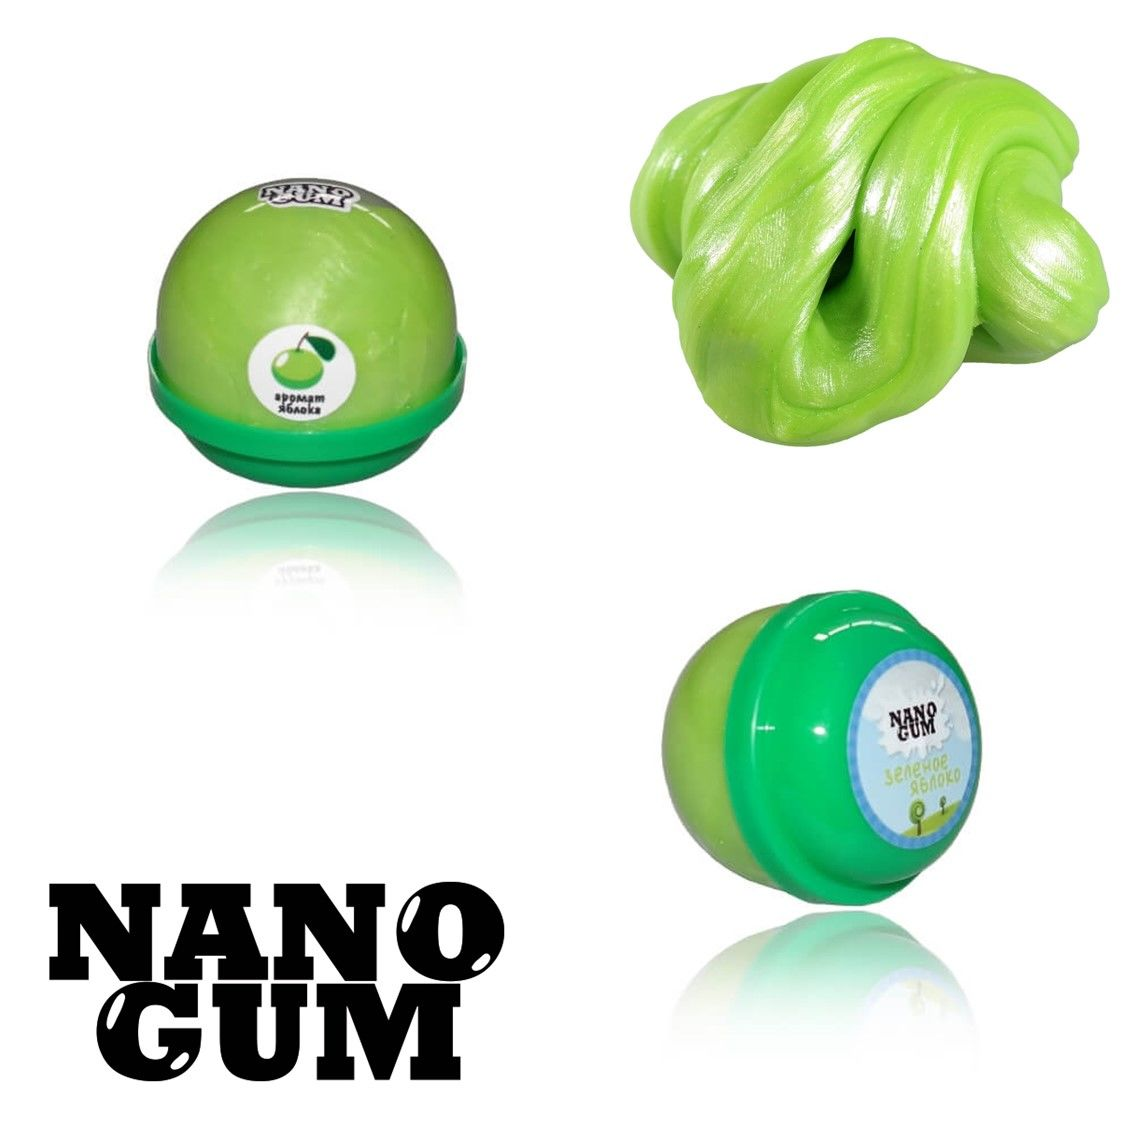 Жвачка для рук Nano gum Зеленое Яблоко 25гр.